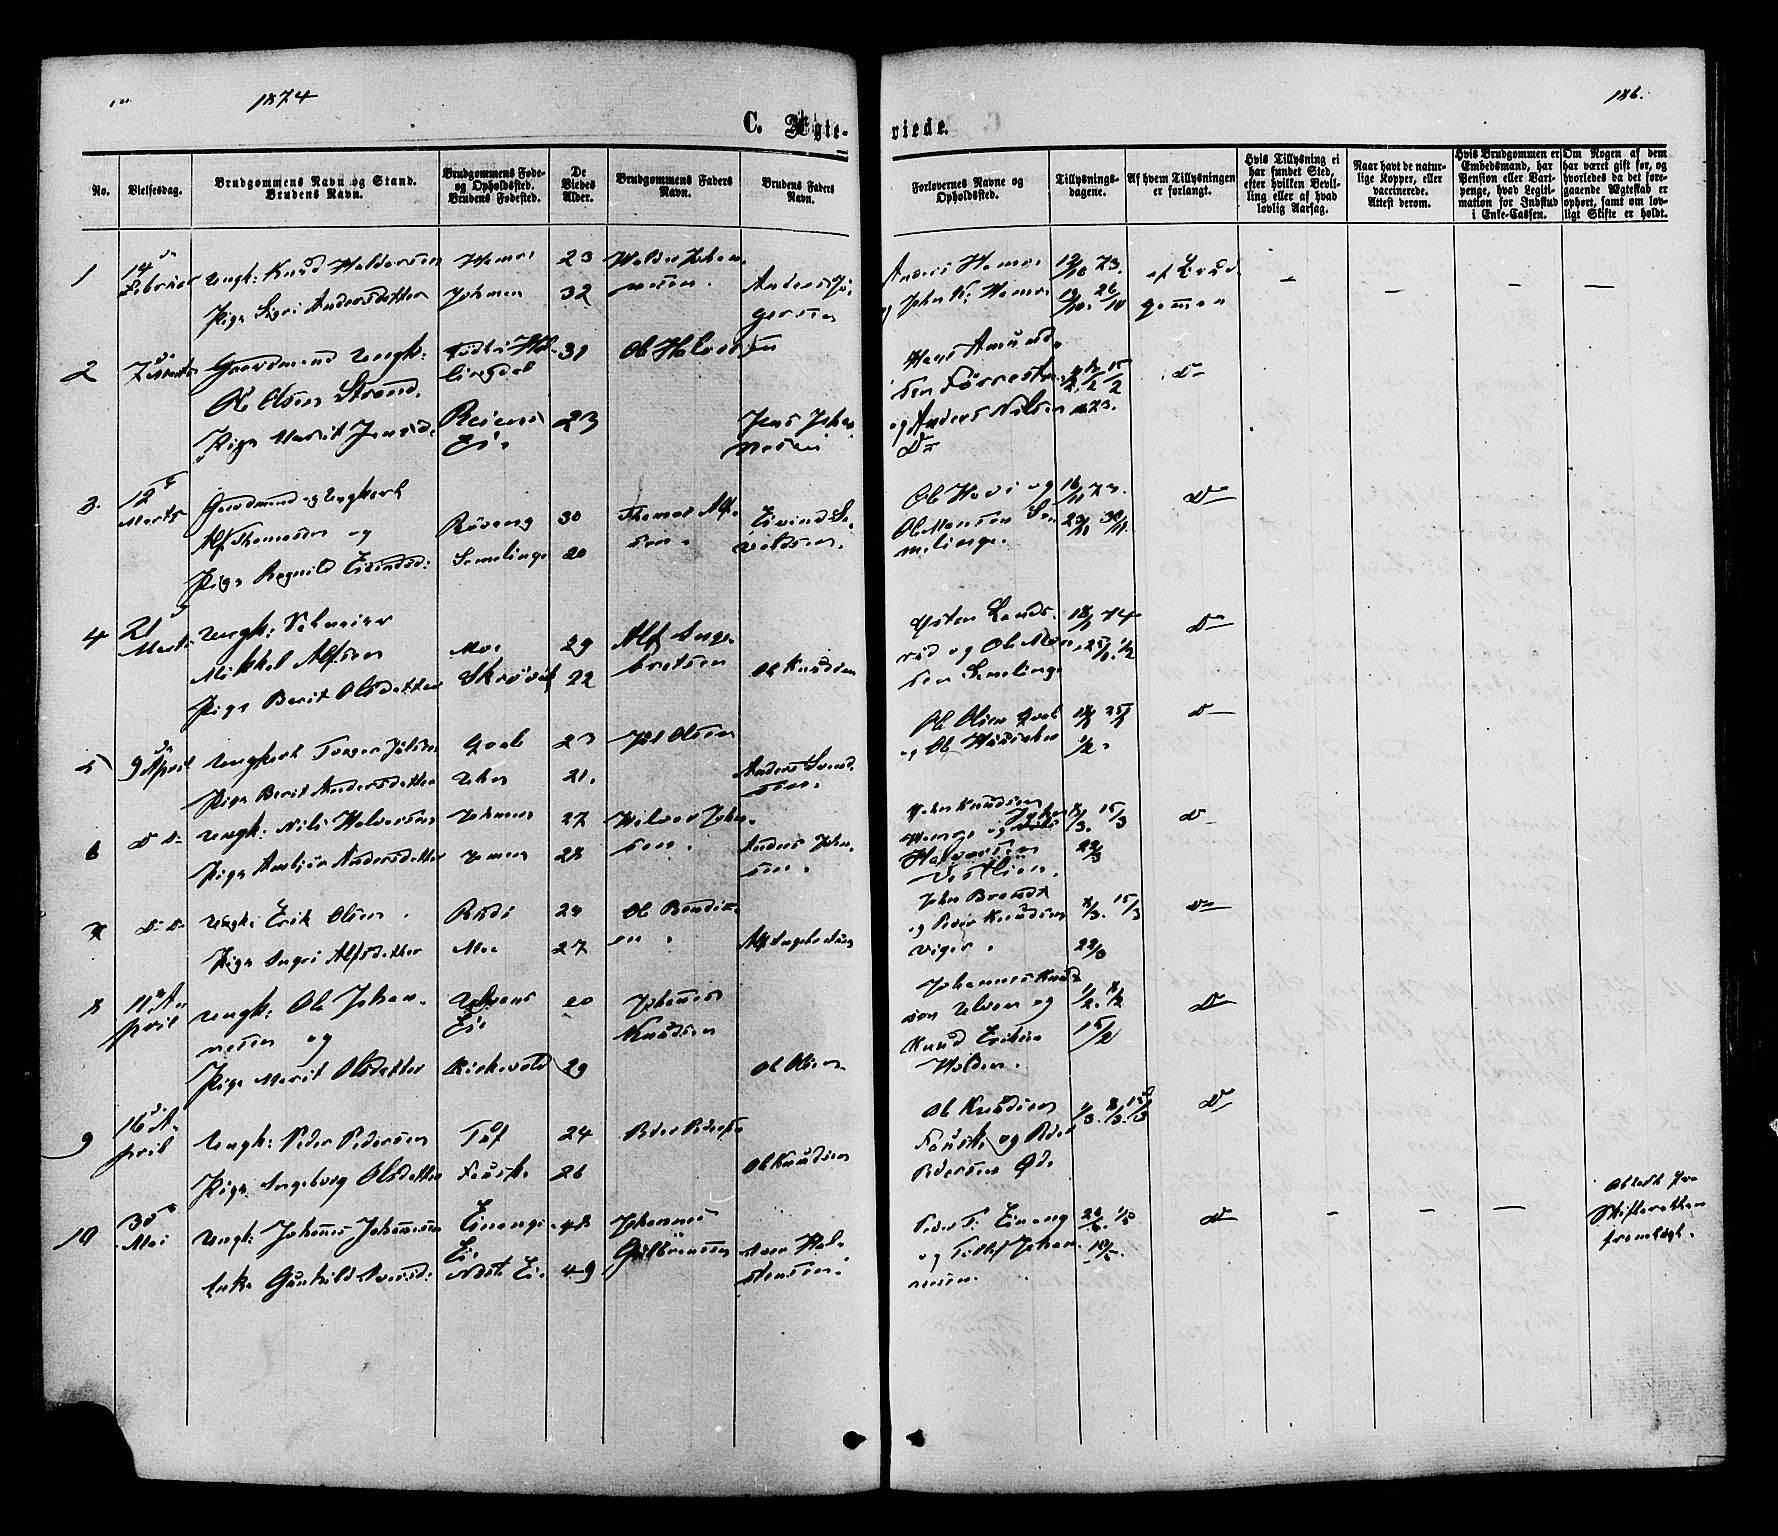 SAH, Vestre Slidre prestekontor, Ministerialbok nr. 3, 1865-1880, s. 186